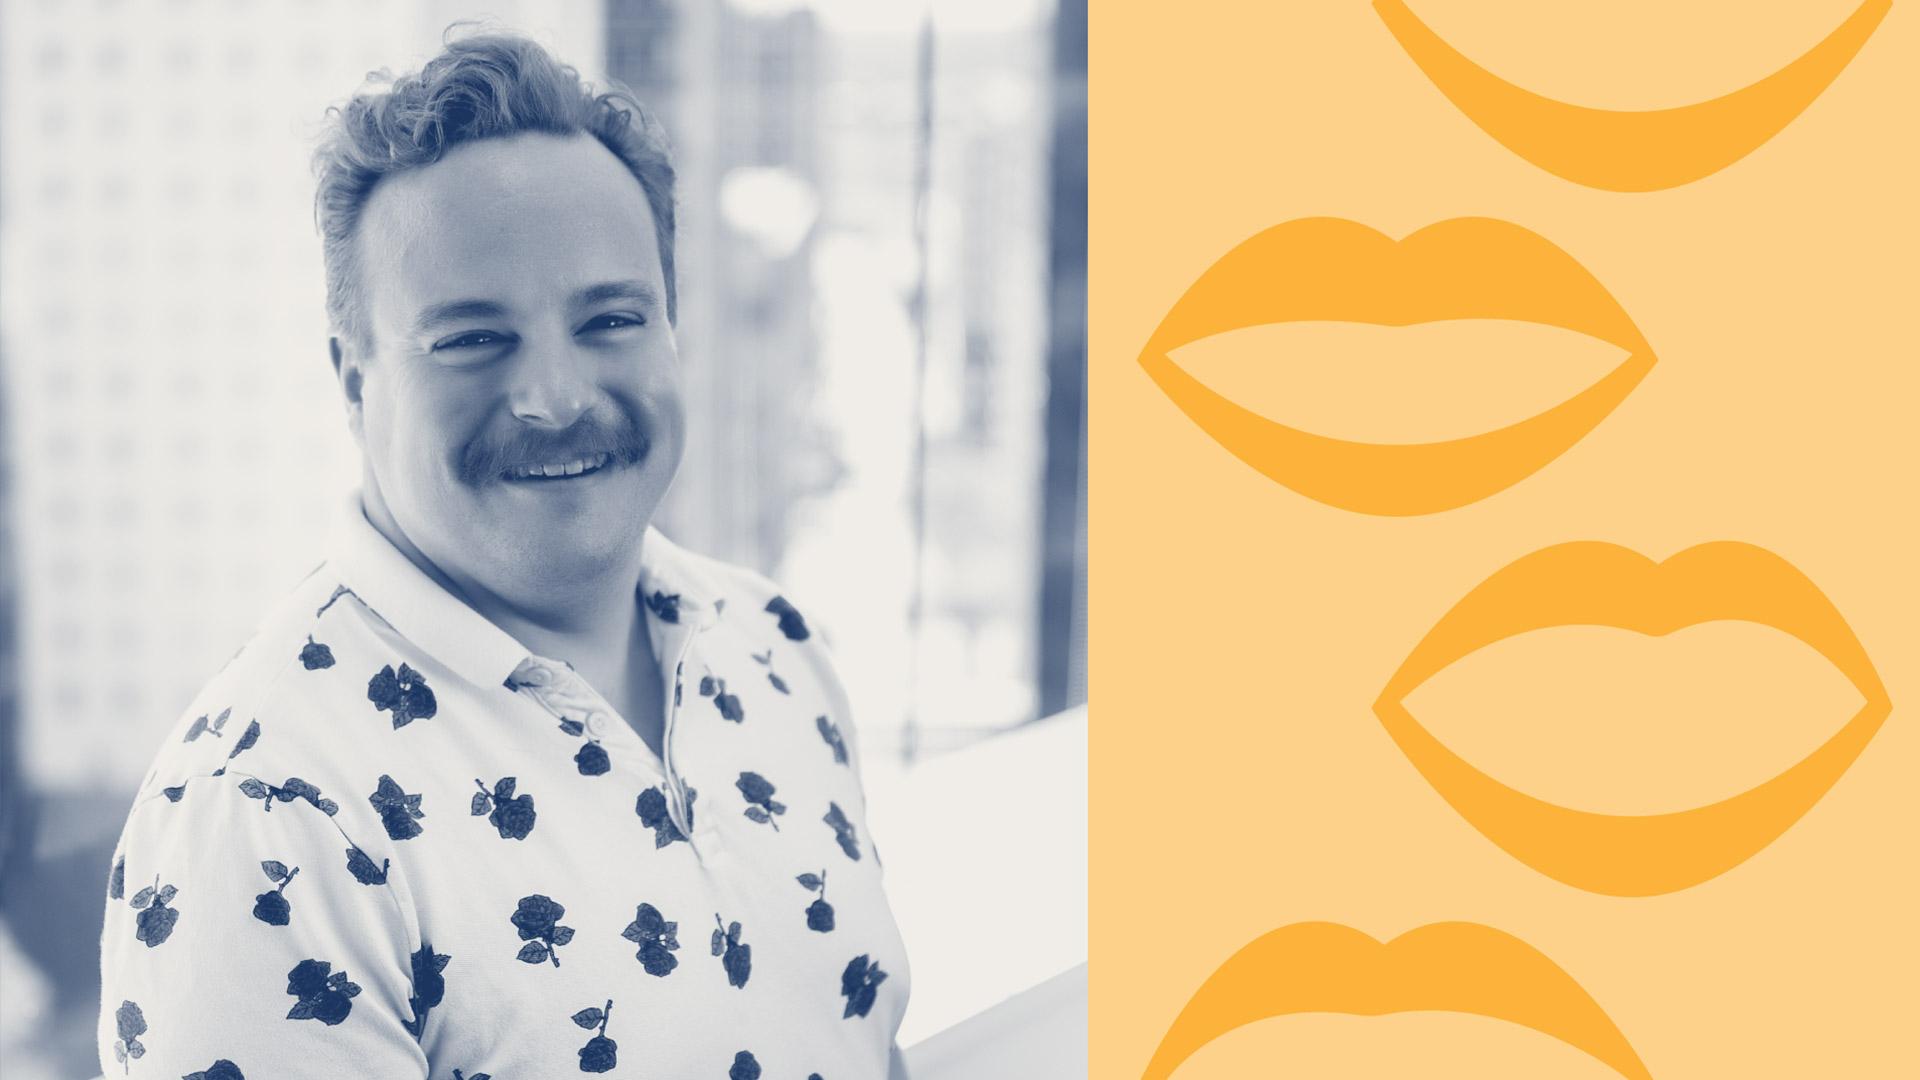 Meet storyteller and software engineer Doug Valenta